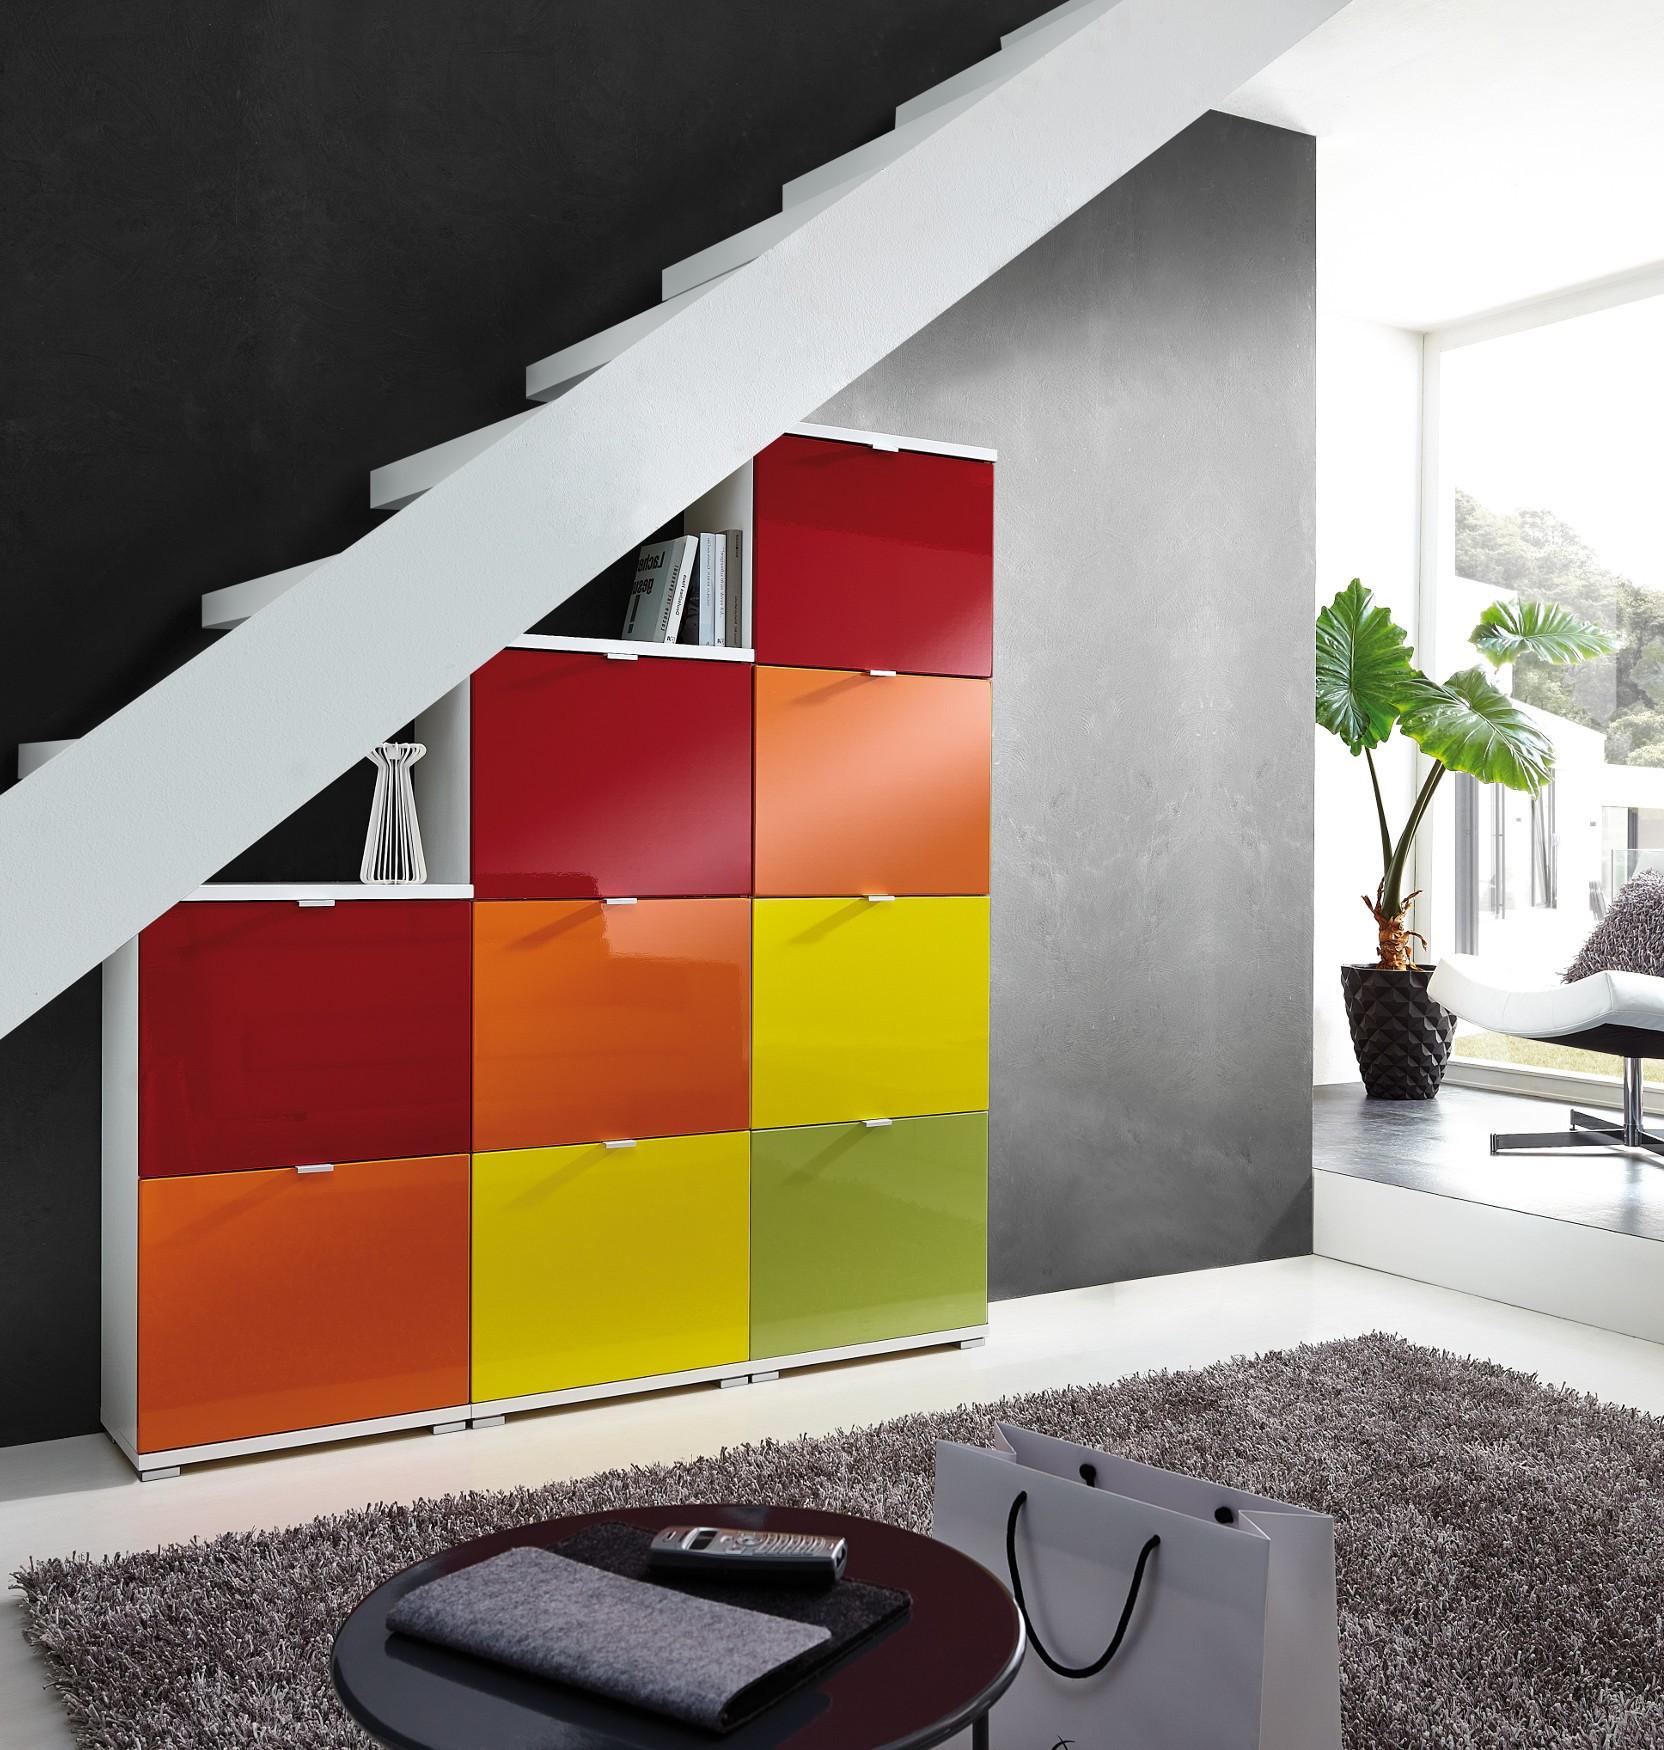 schuhschrank wand potpourri bunter schuhkipper bis zu 36. Black Bedroom Furniture Sets. Home Design Ideas